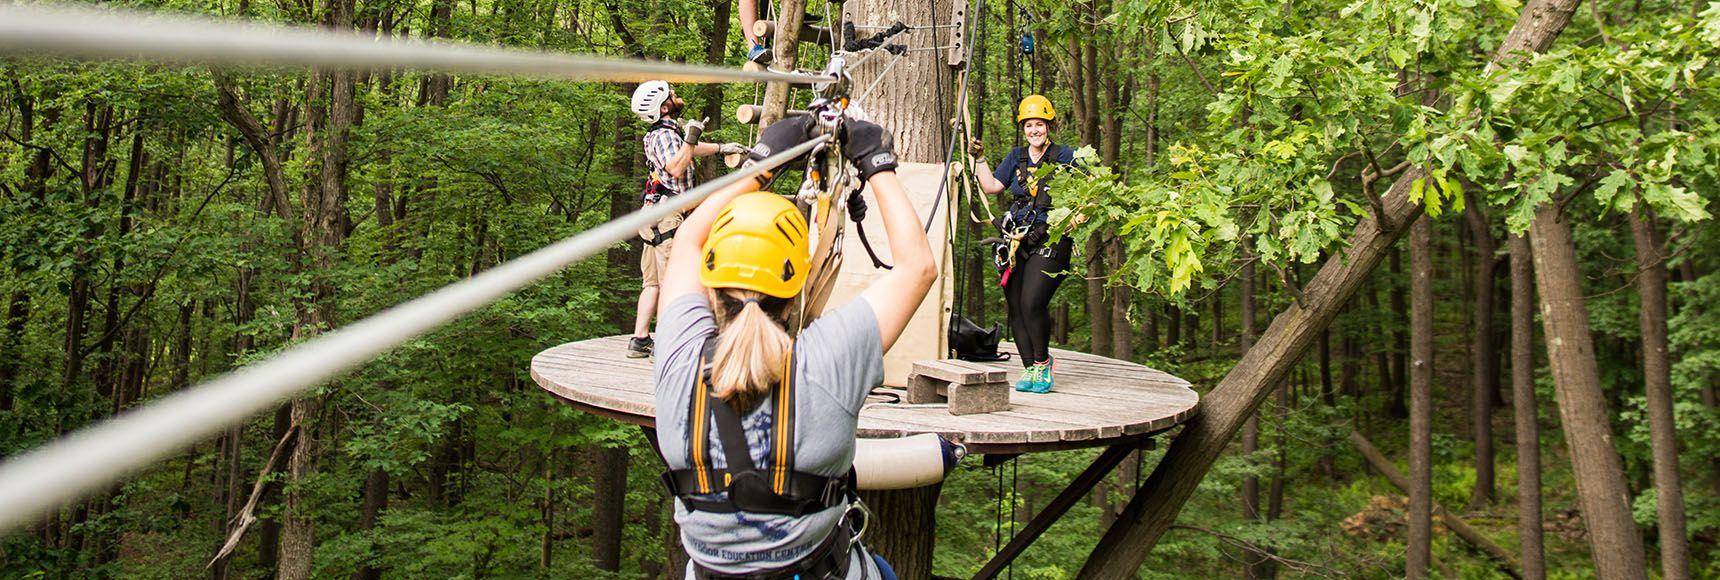 Appalachian Aerial Symposium & Appalachian Aerial Symposium | Outdoor Education Center | West ...